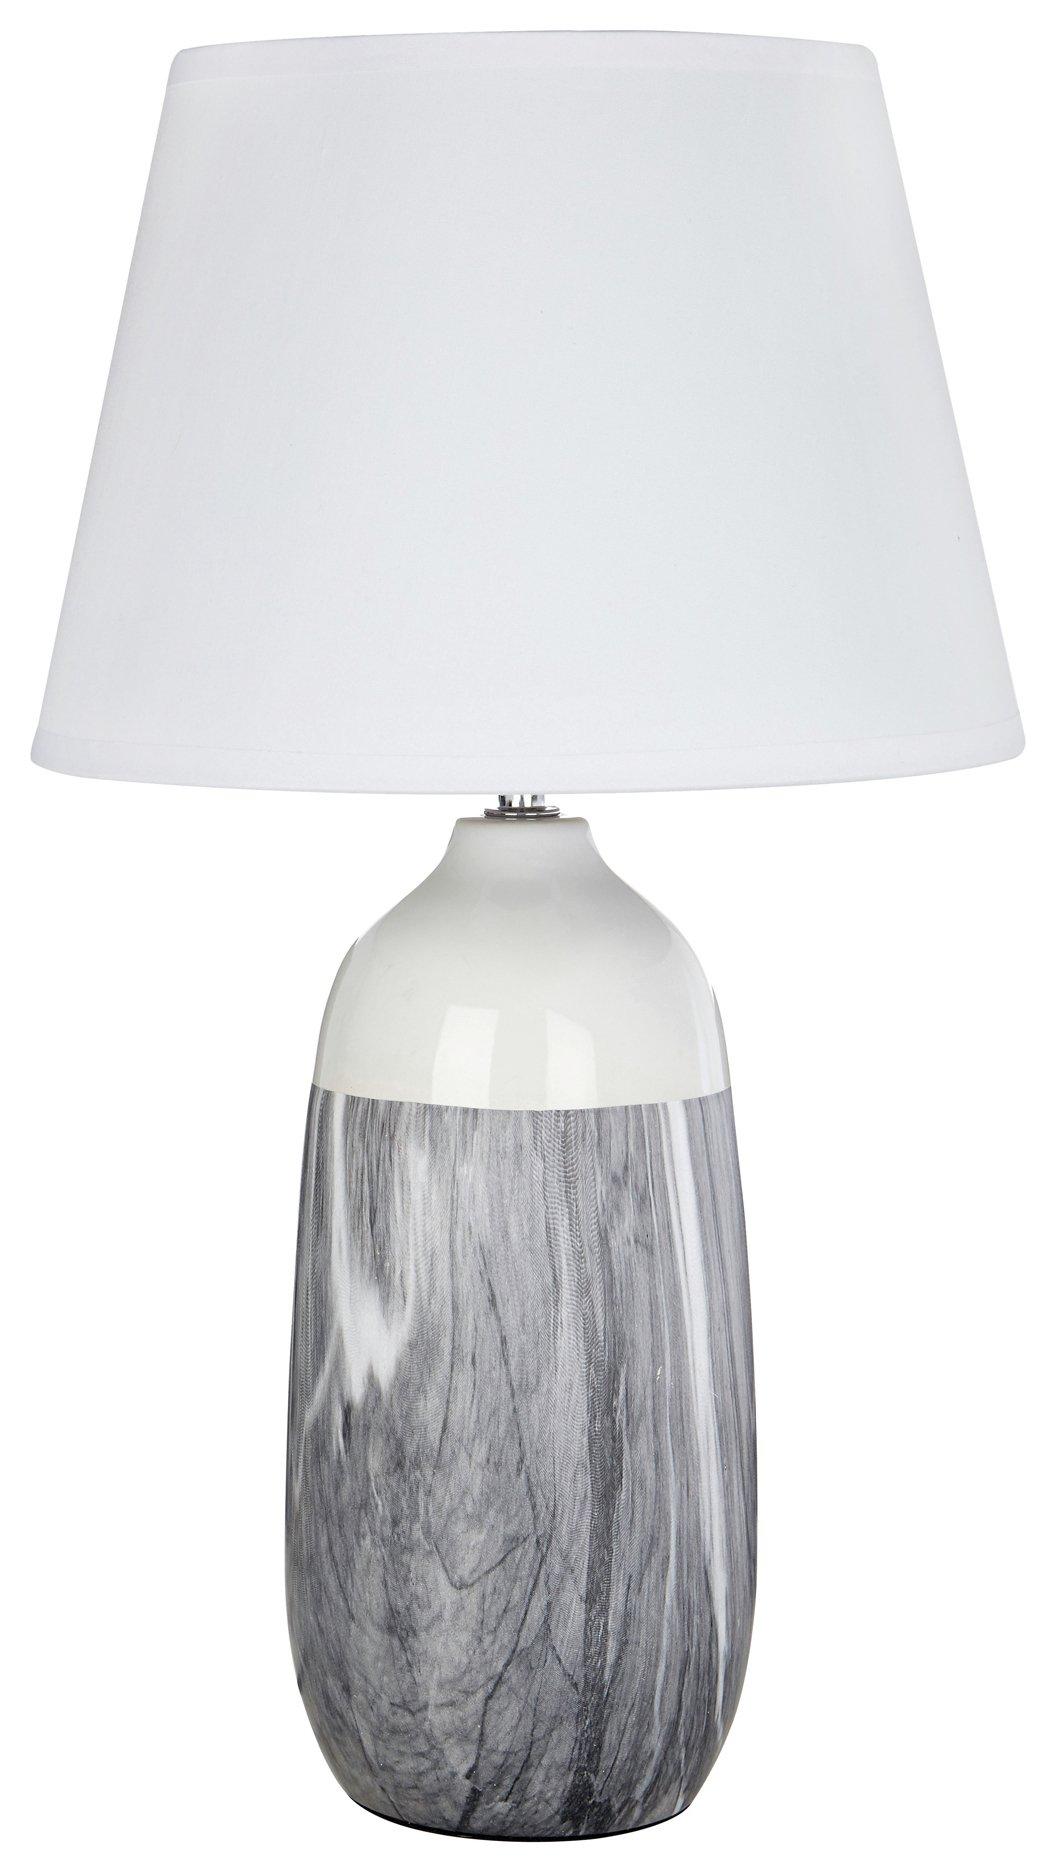 Welma Ceramic Table Lamp - Grey